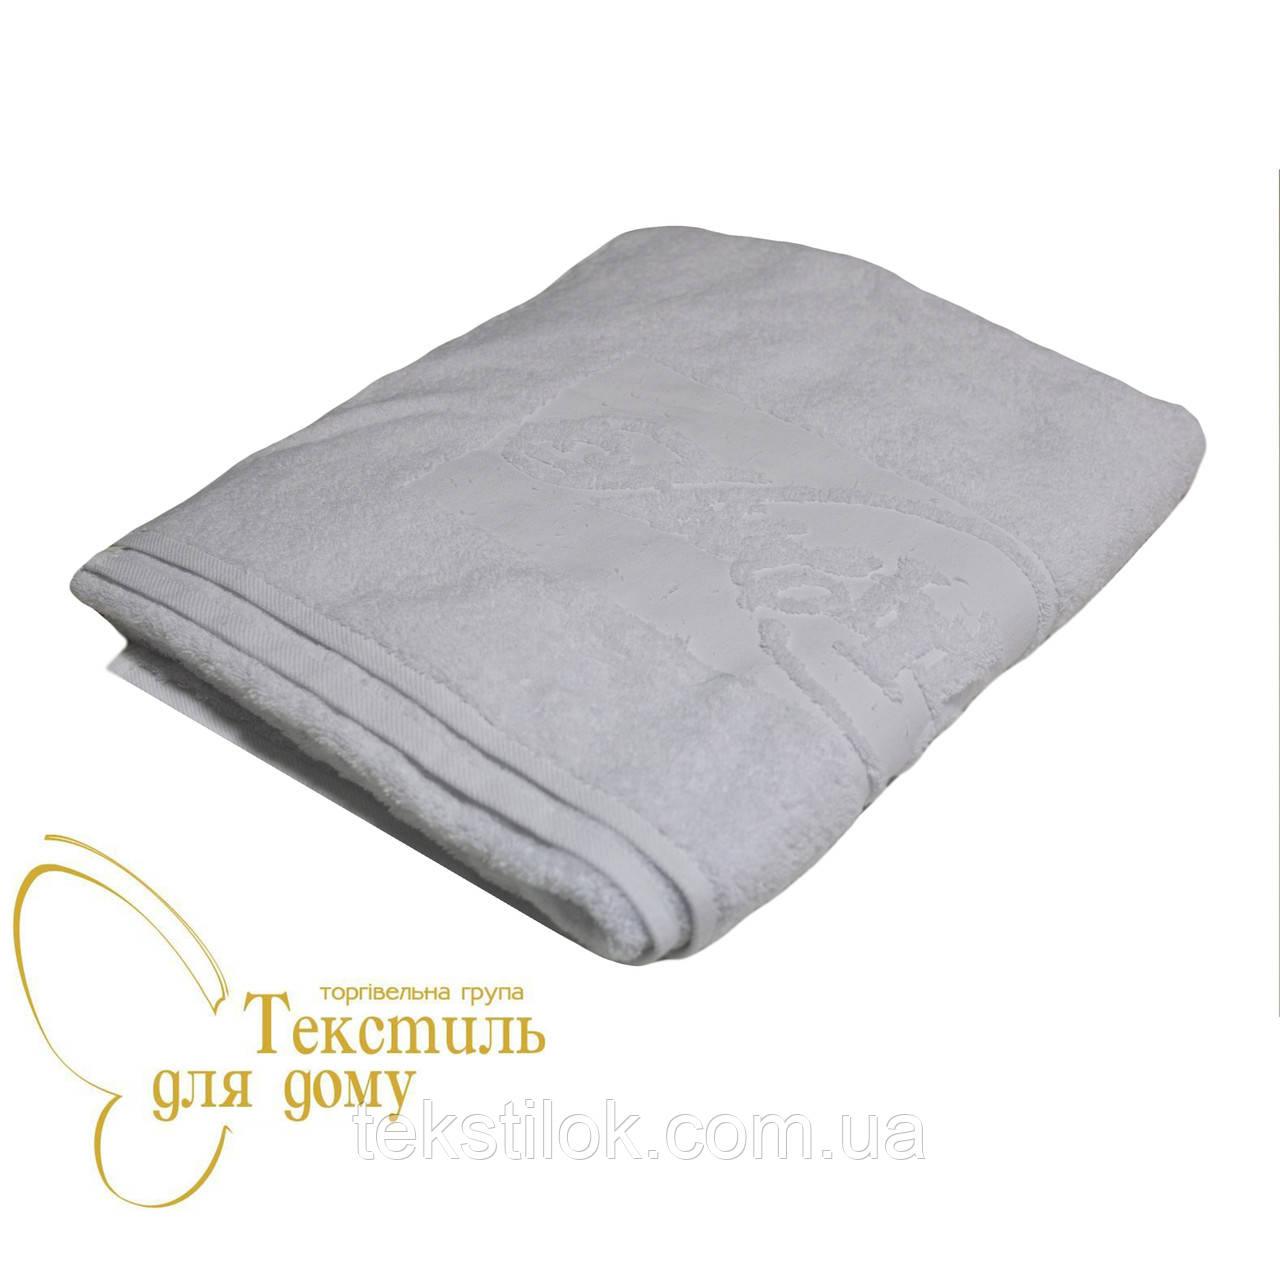 Полотенце для сауны 75*180, 575 гр/м2,16/1, белое